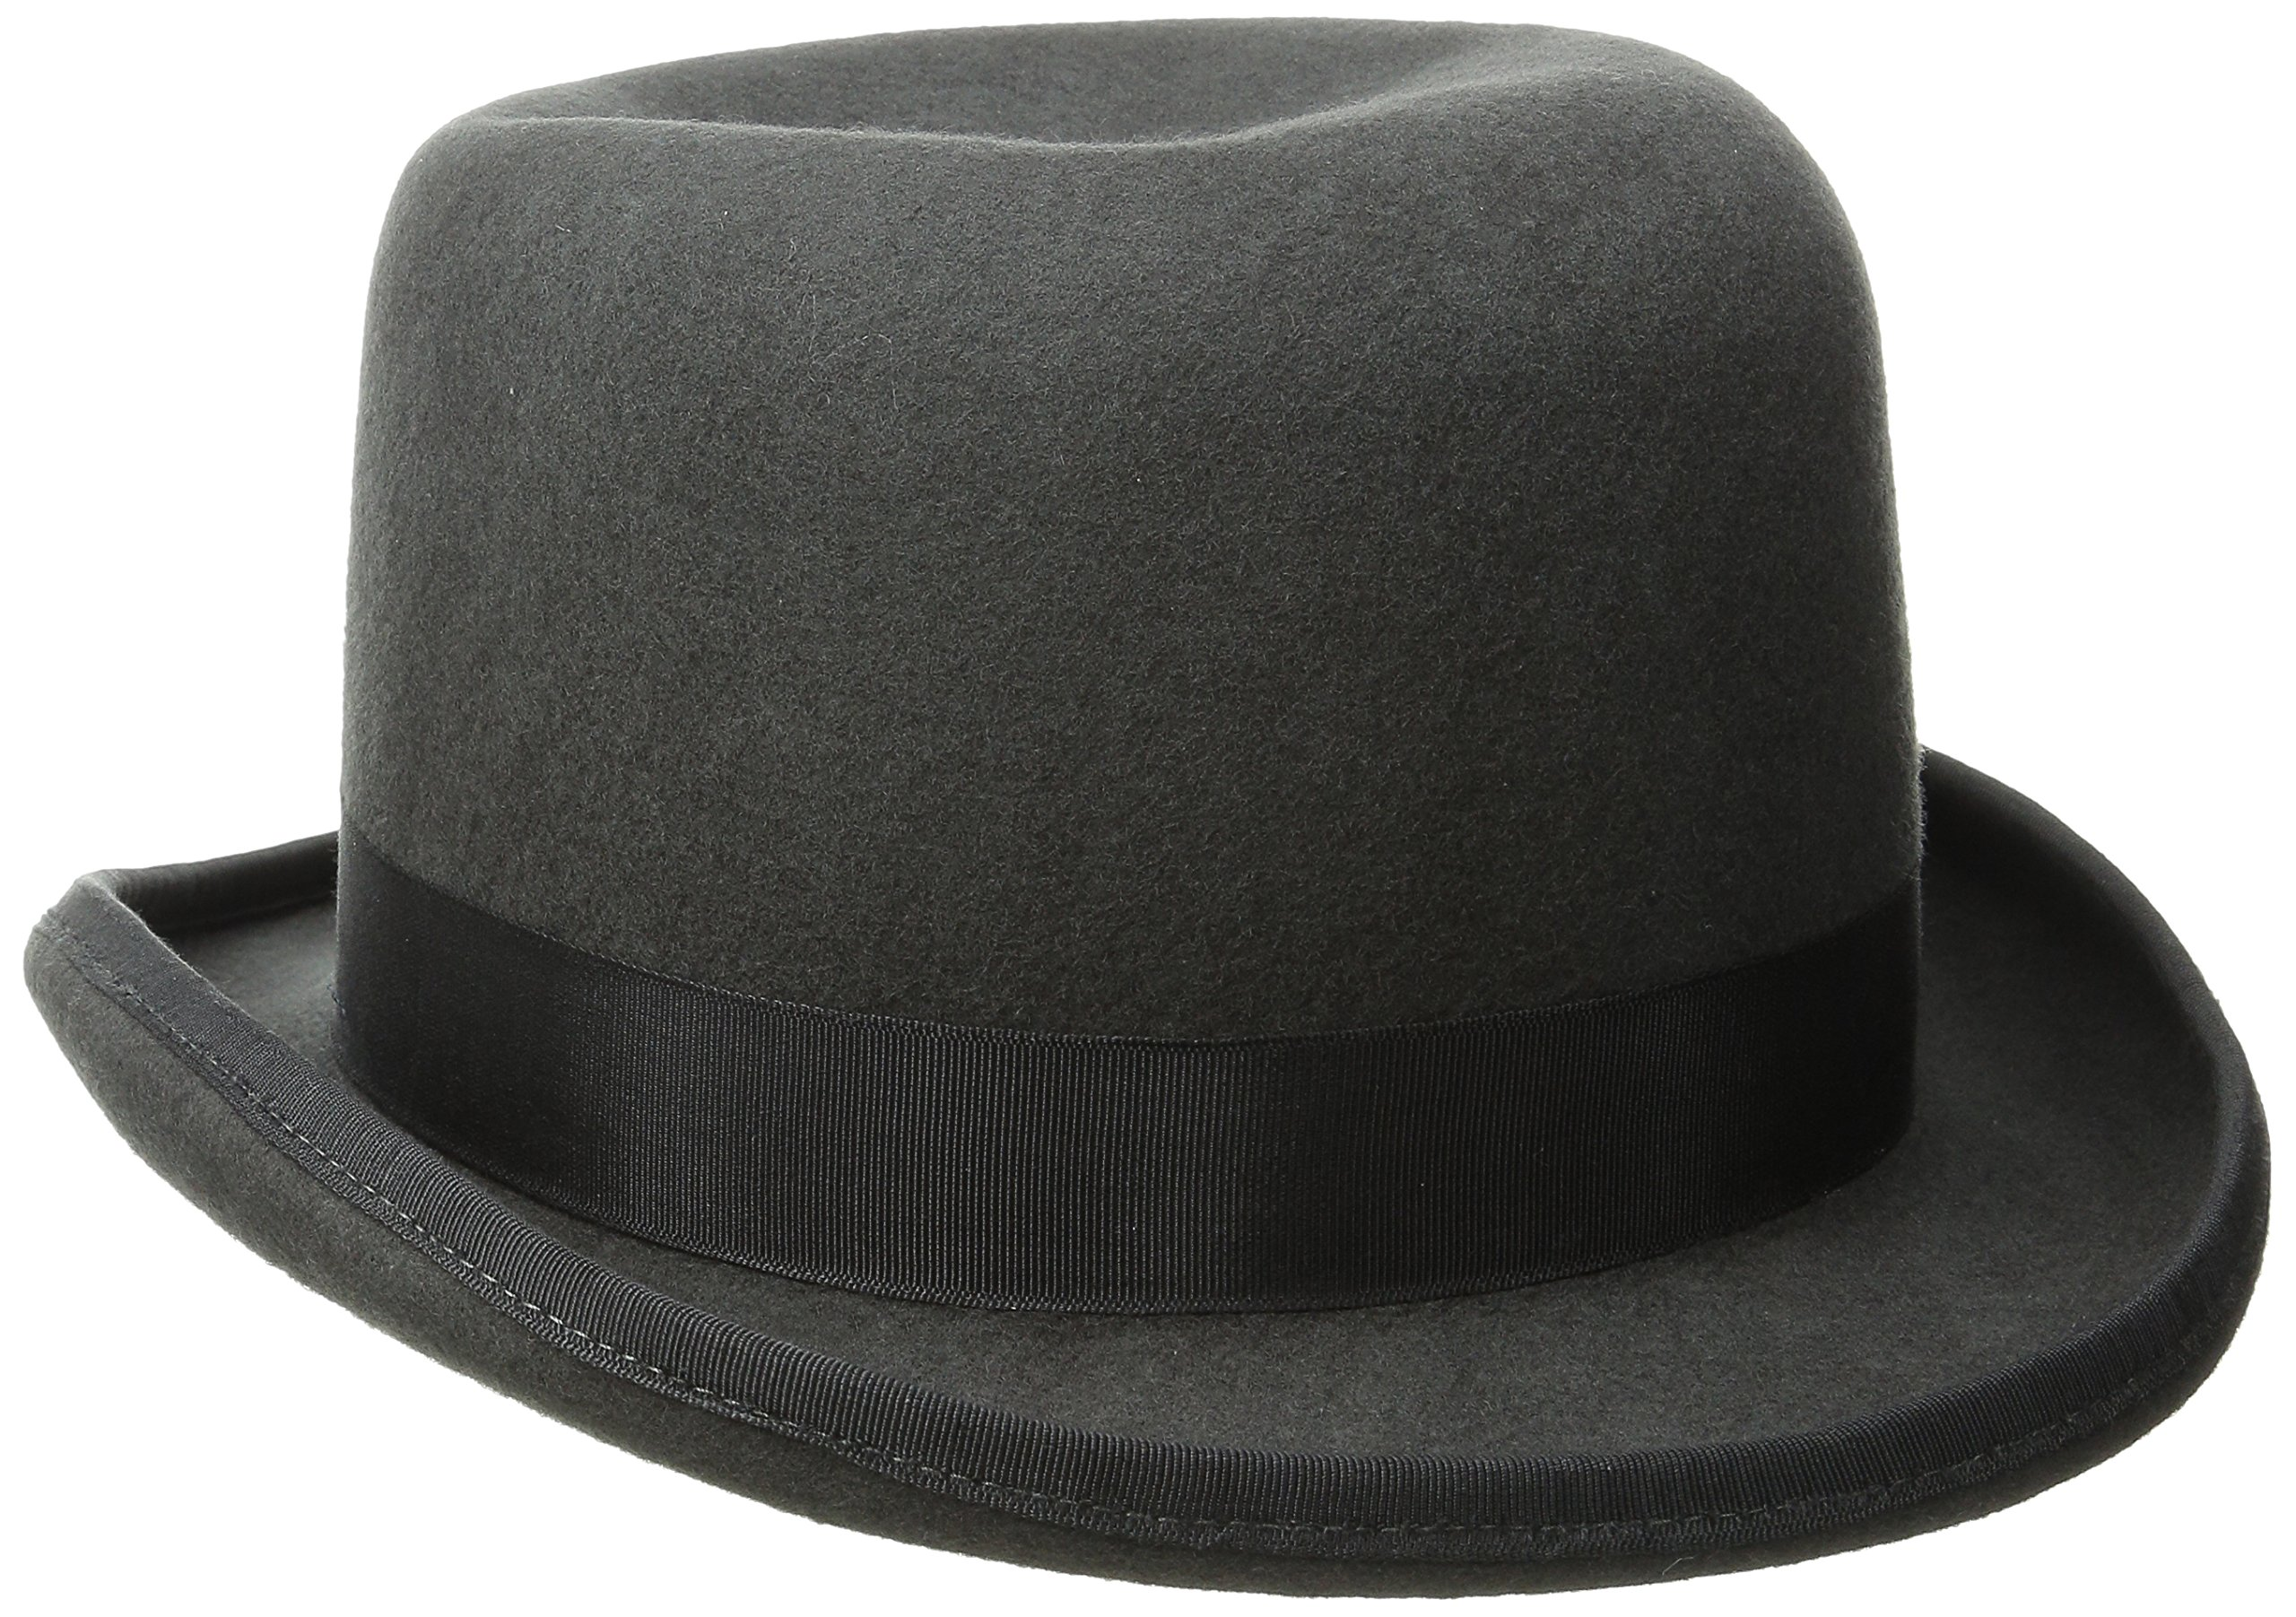 Scala Men's Wool Felt Derby Hat, Charcoal, Medium